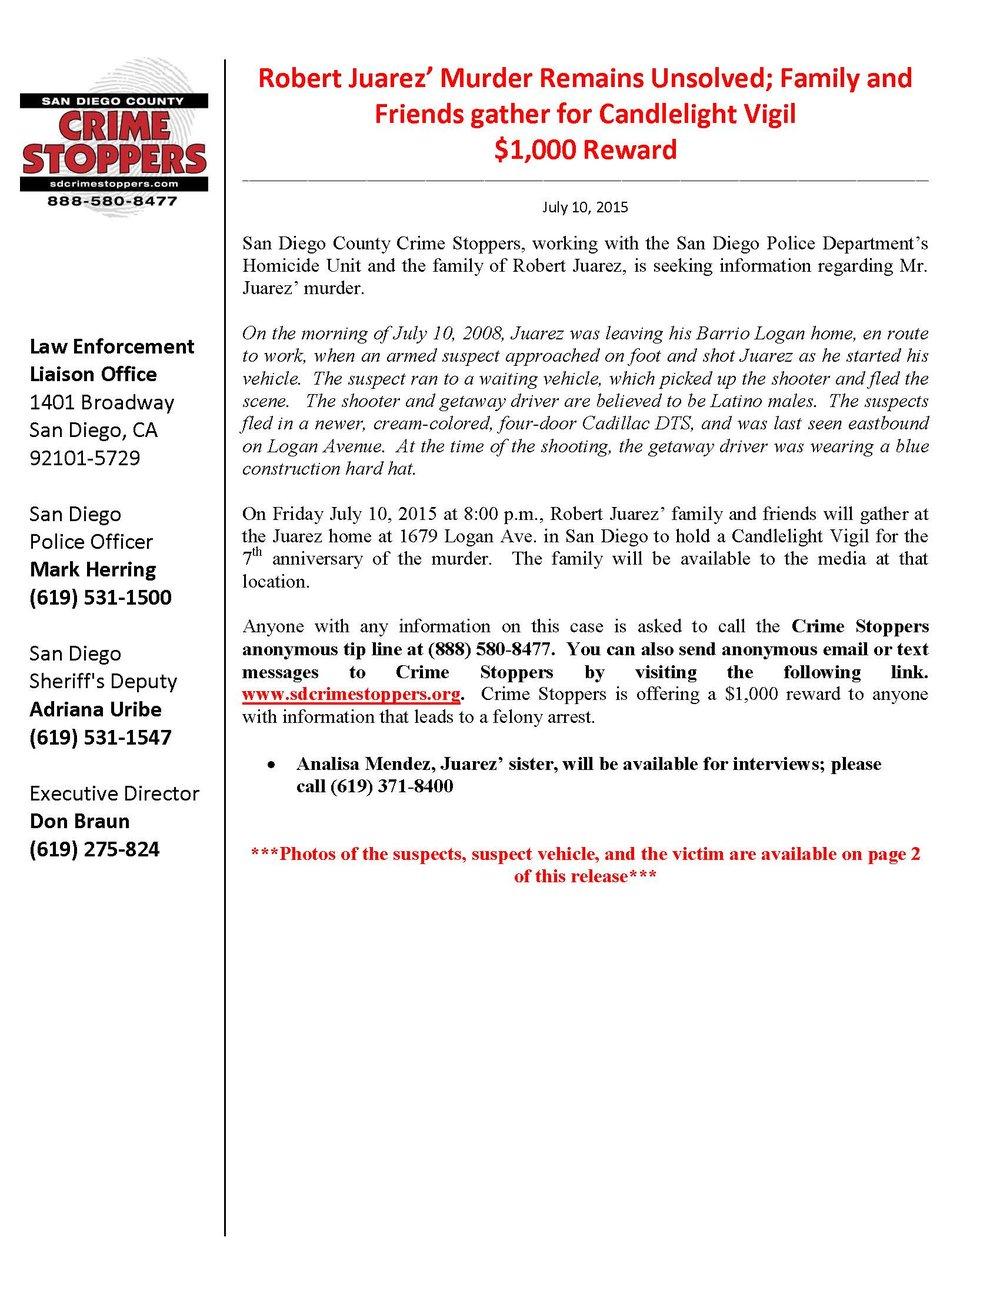 071015 Robert Juarez Homicide 7th Anniversary_Page_1